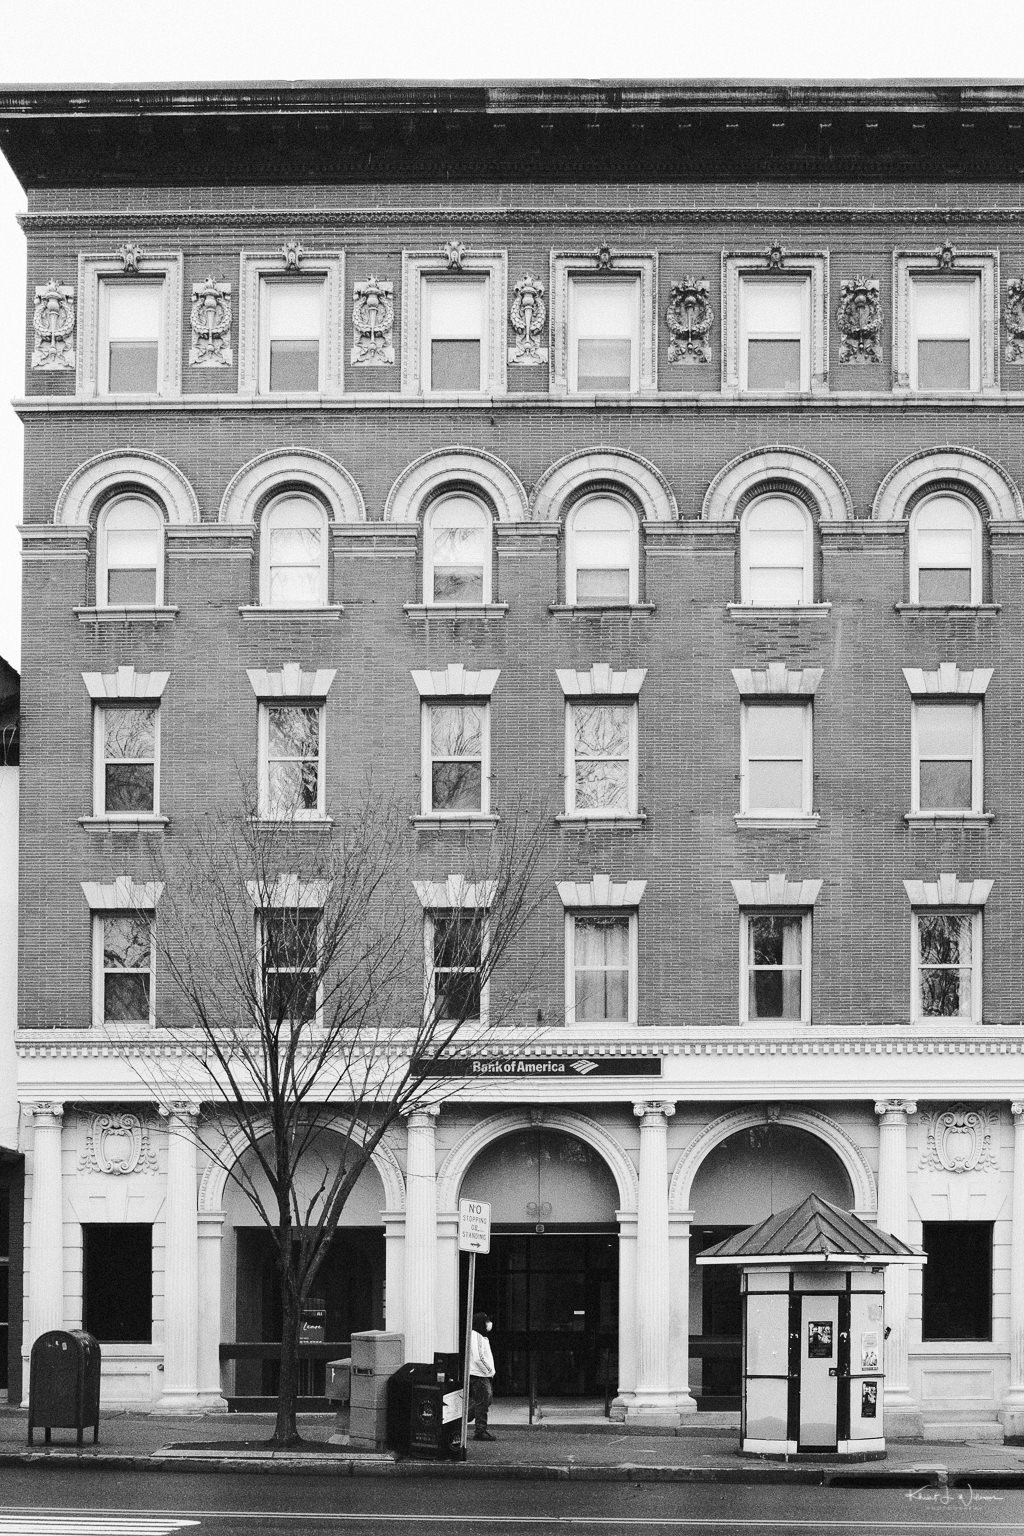 Caesar Trent's Property at 90 Nassau Street in Princeton